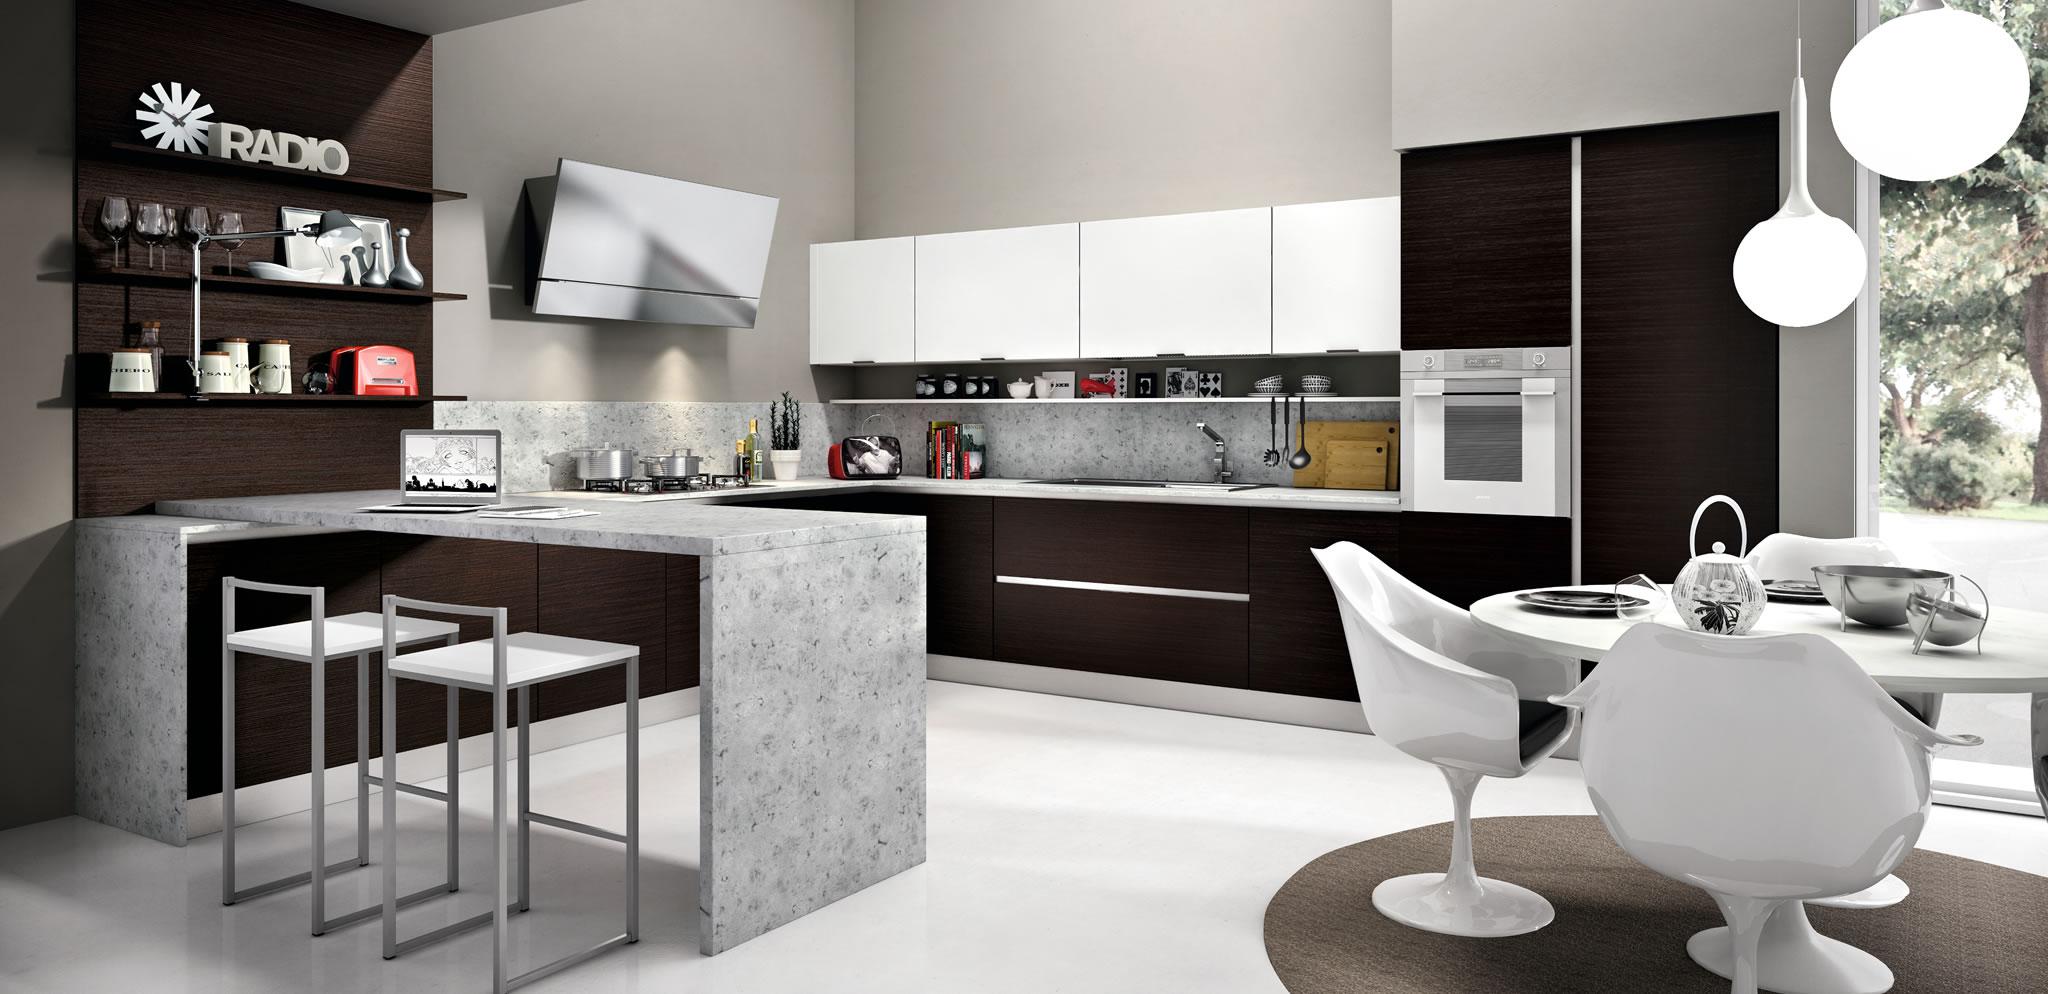 Moderna kuhinja sygna - Cucina ikea opinioni ...